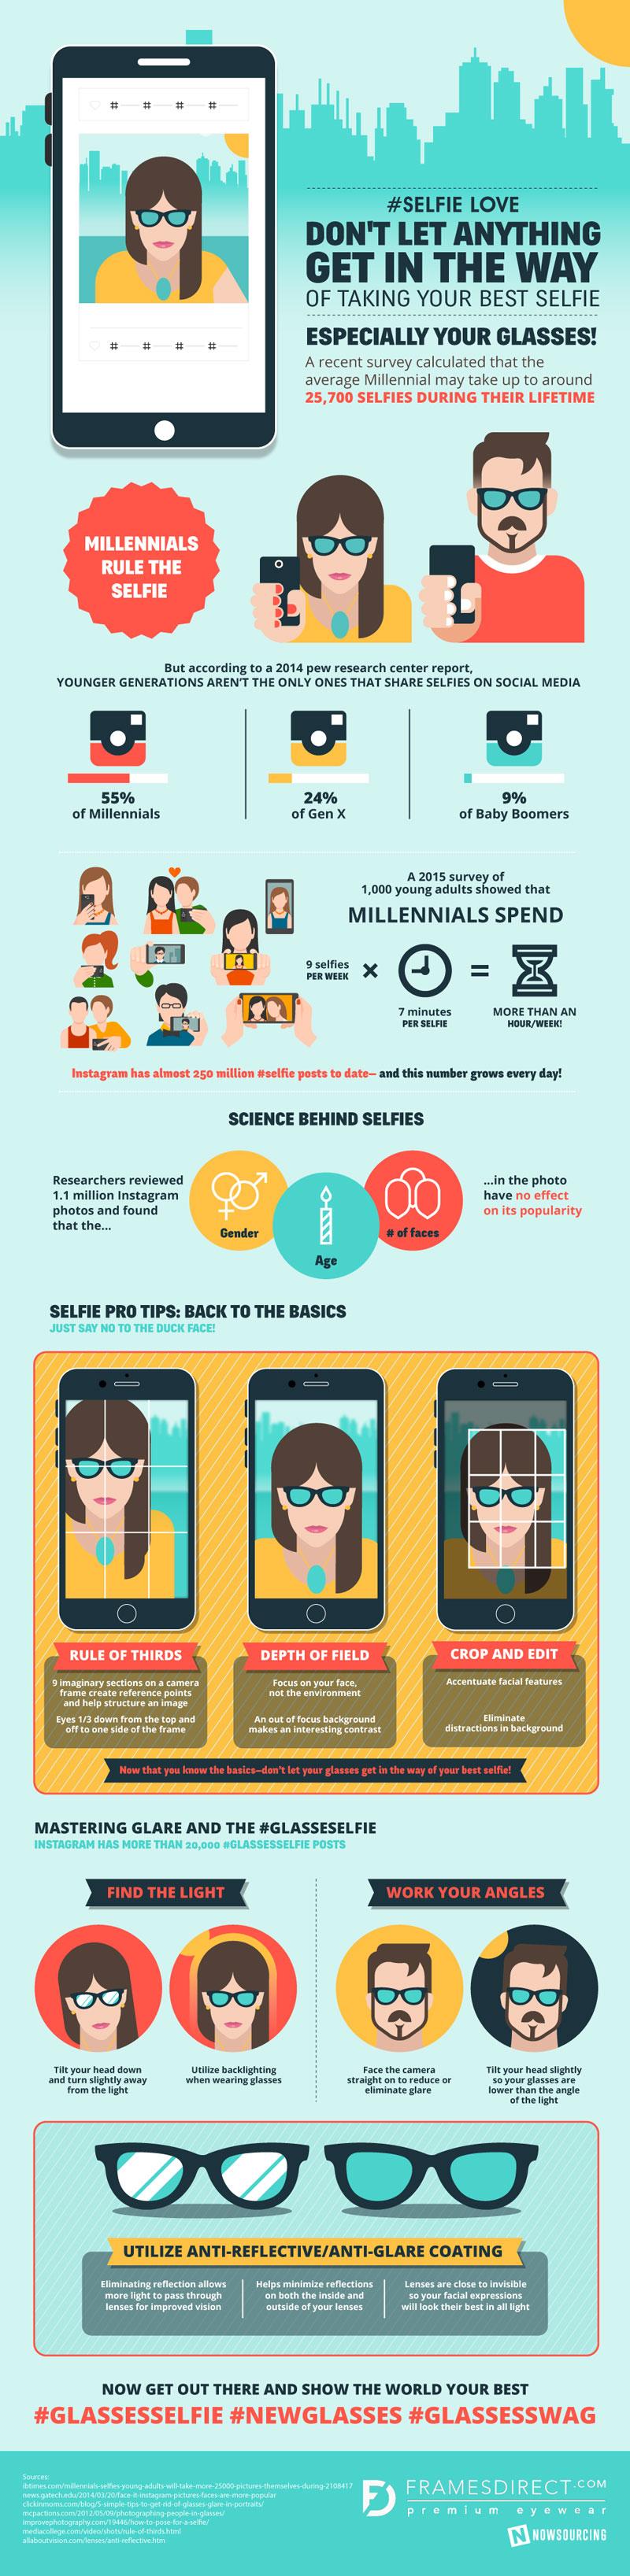 selfies-infographic